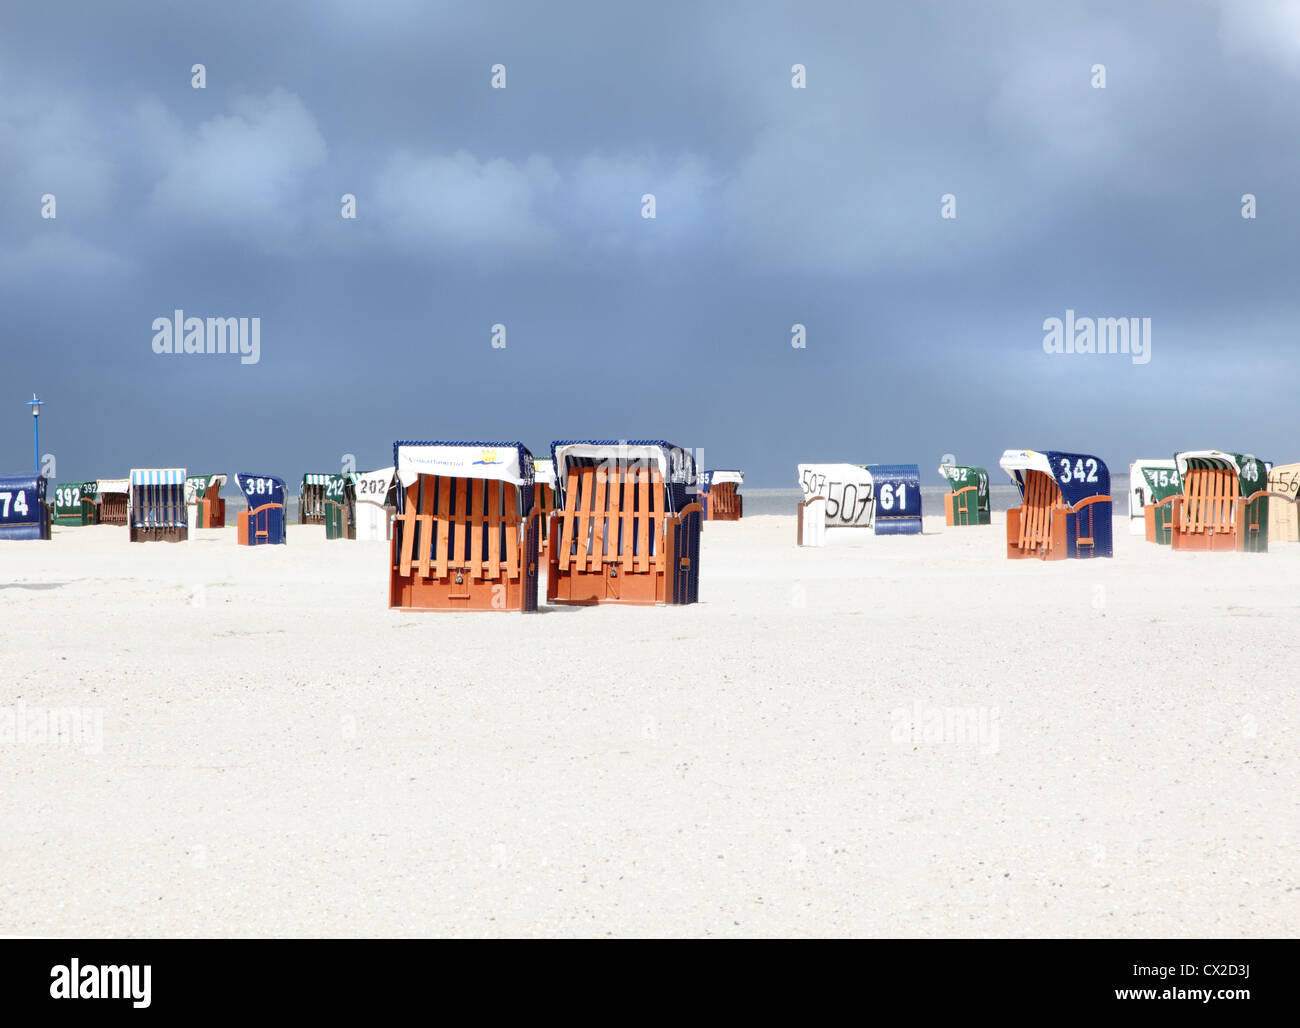 Europa, Germany, Friesland, Strandkörbe Sandsturm Wremen Ostfriesland Nordsee beachchairs sandstorm North Sea - Stock Image